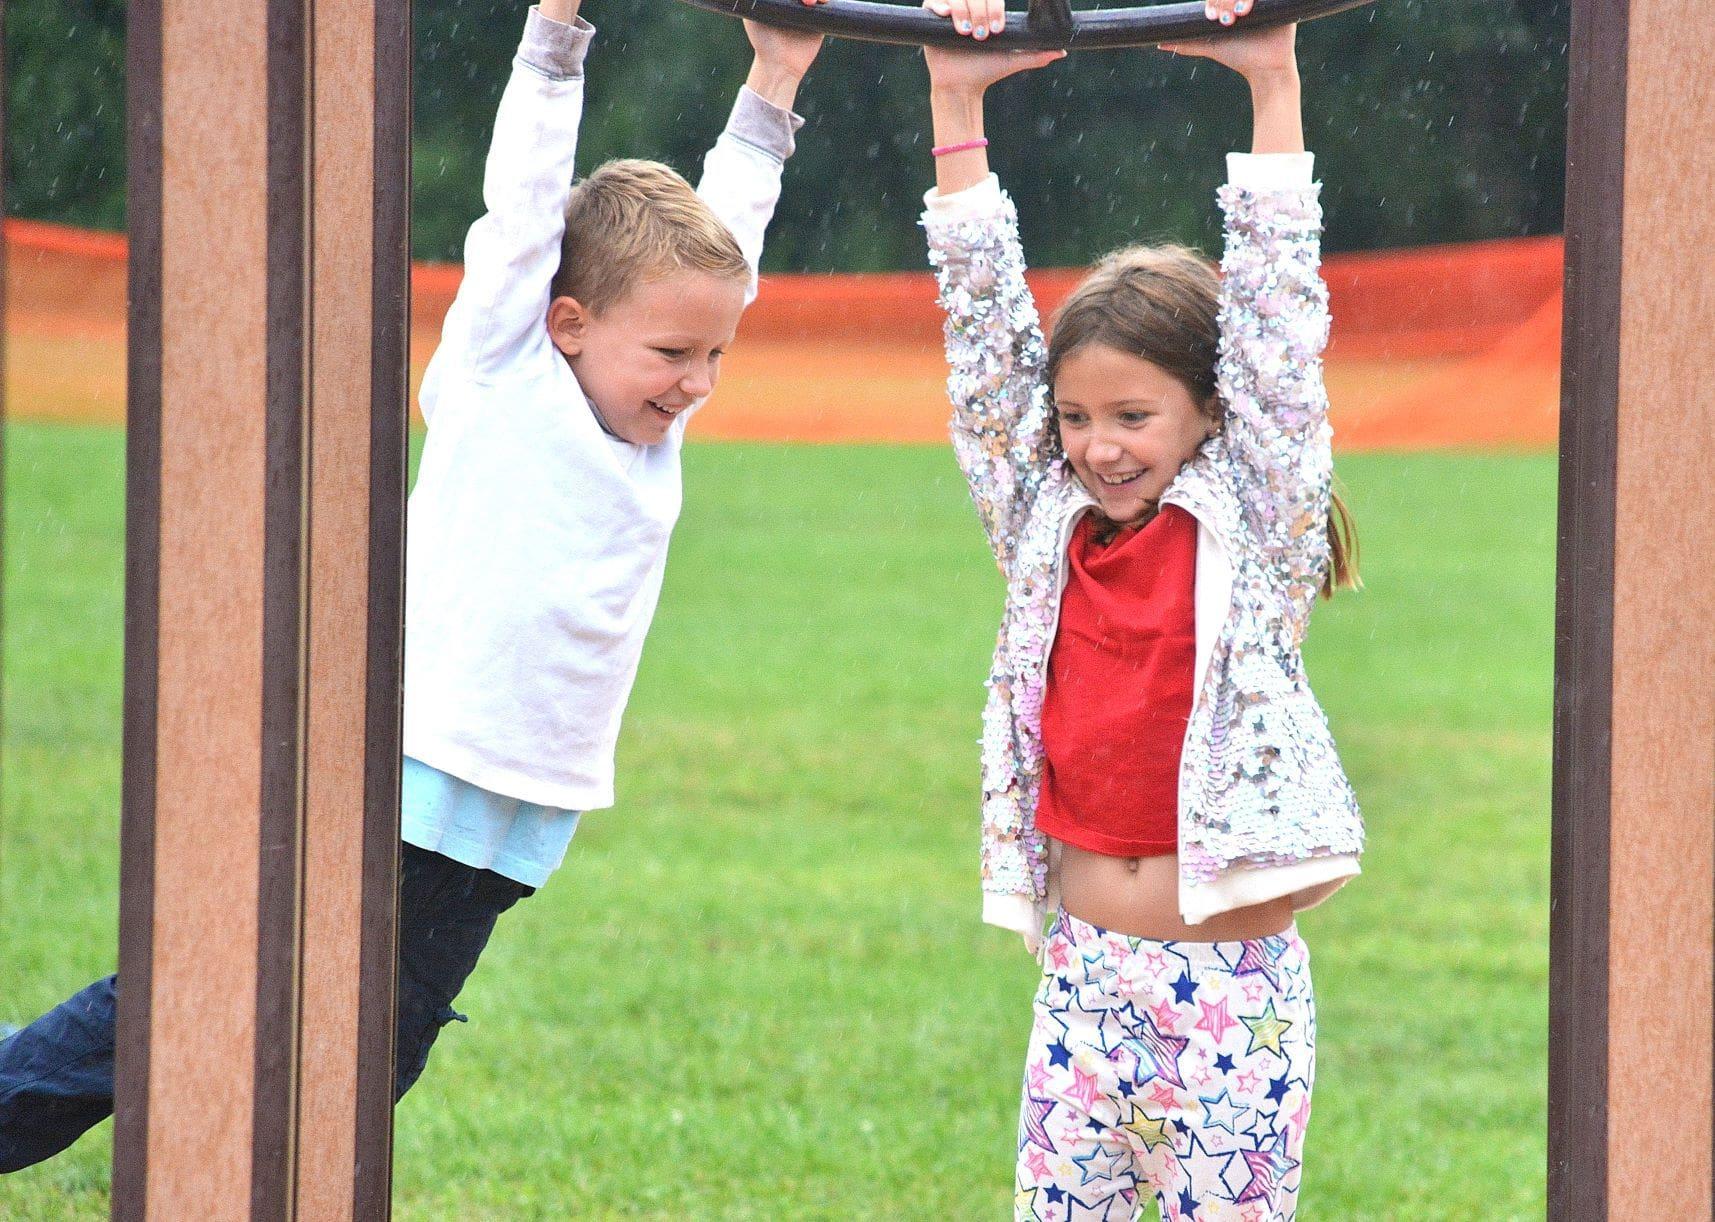 The Stucka siblings – Bradley, 5, and Hayden, 9 – swing together on monkey bars.